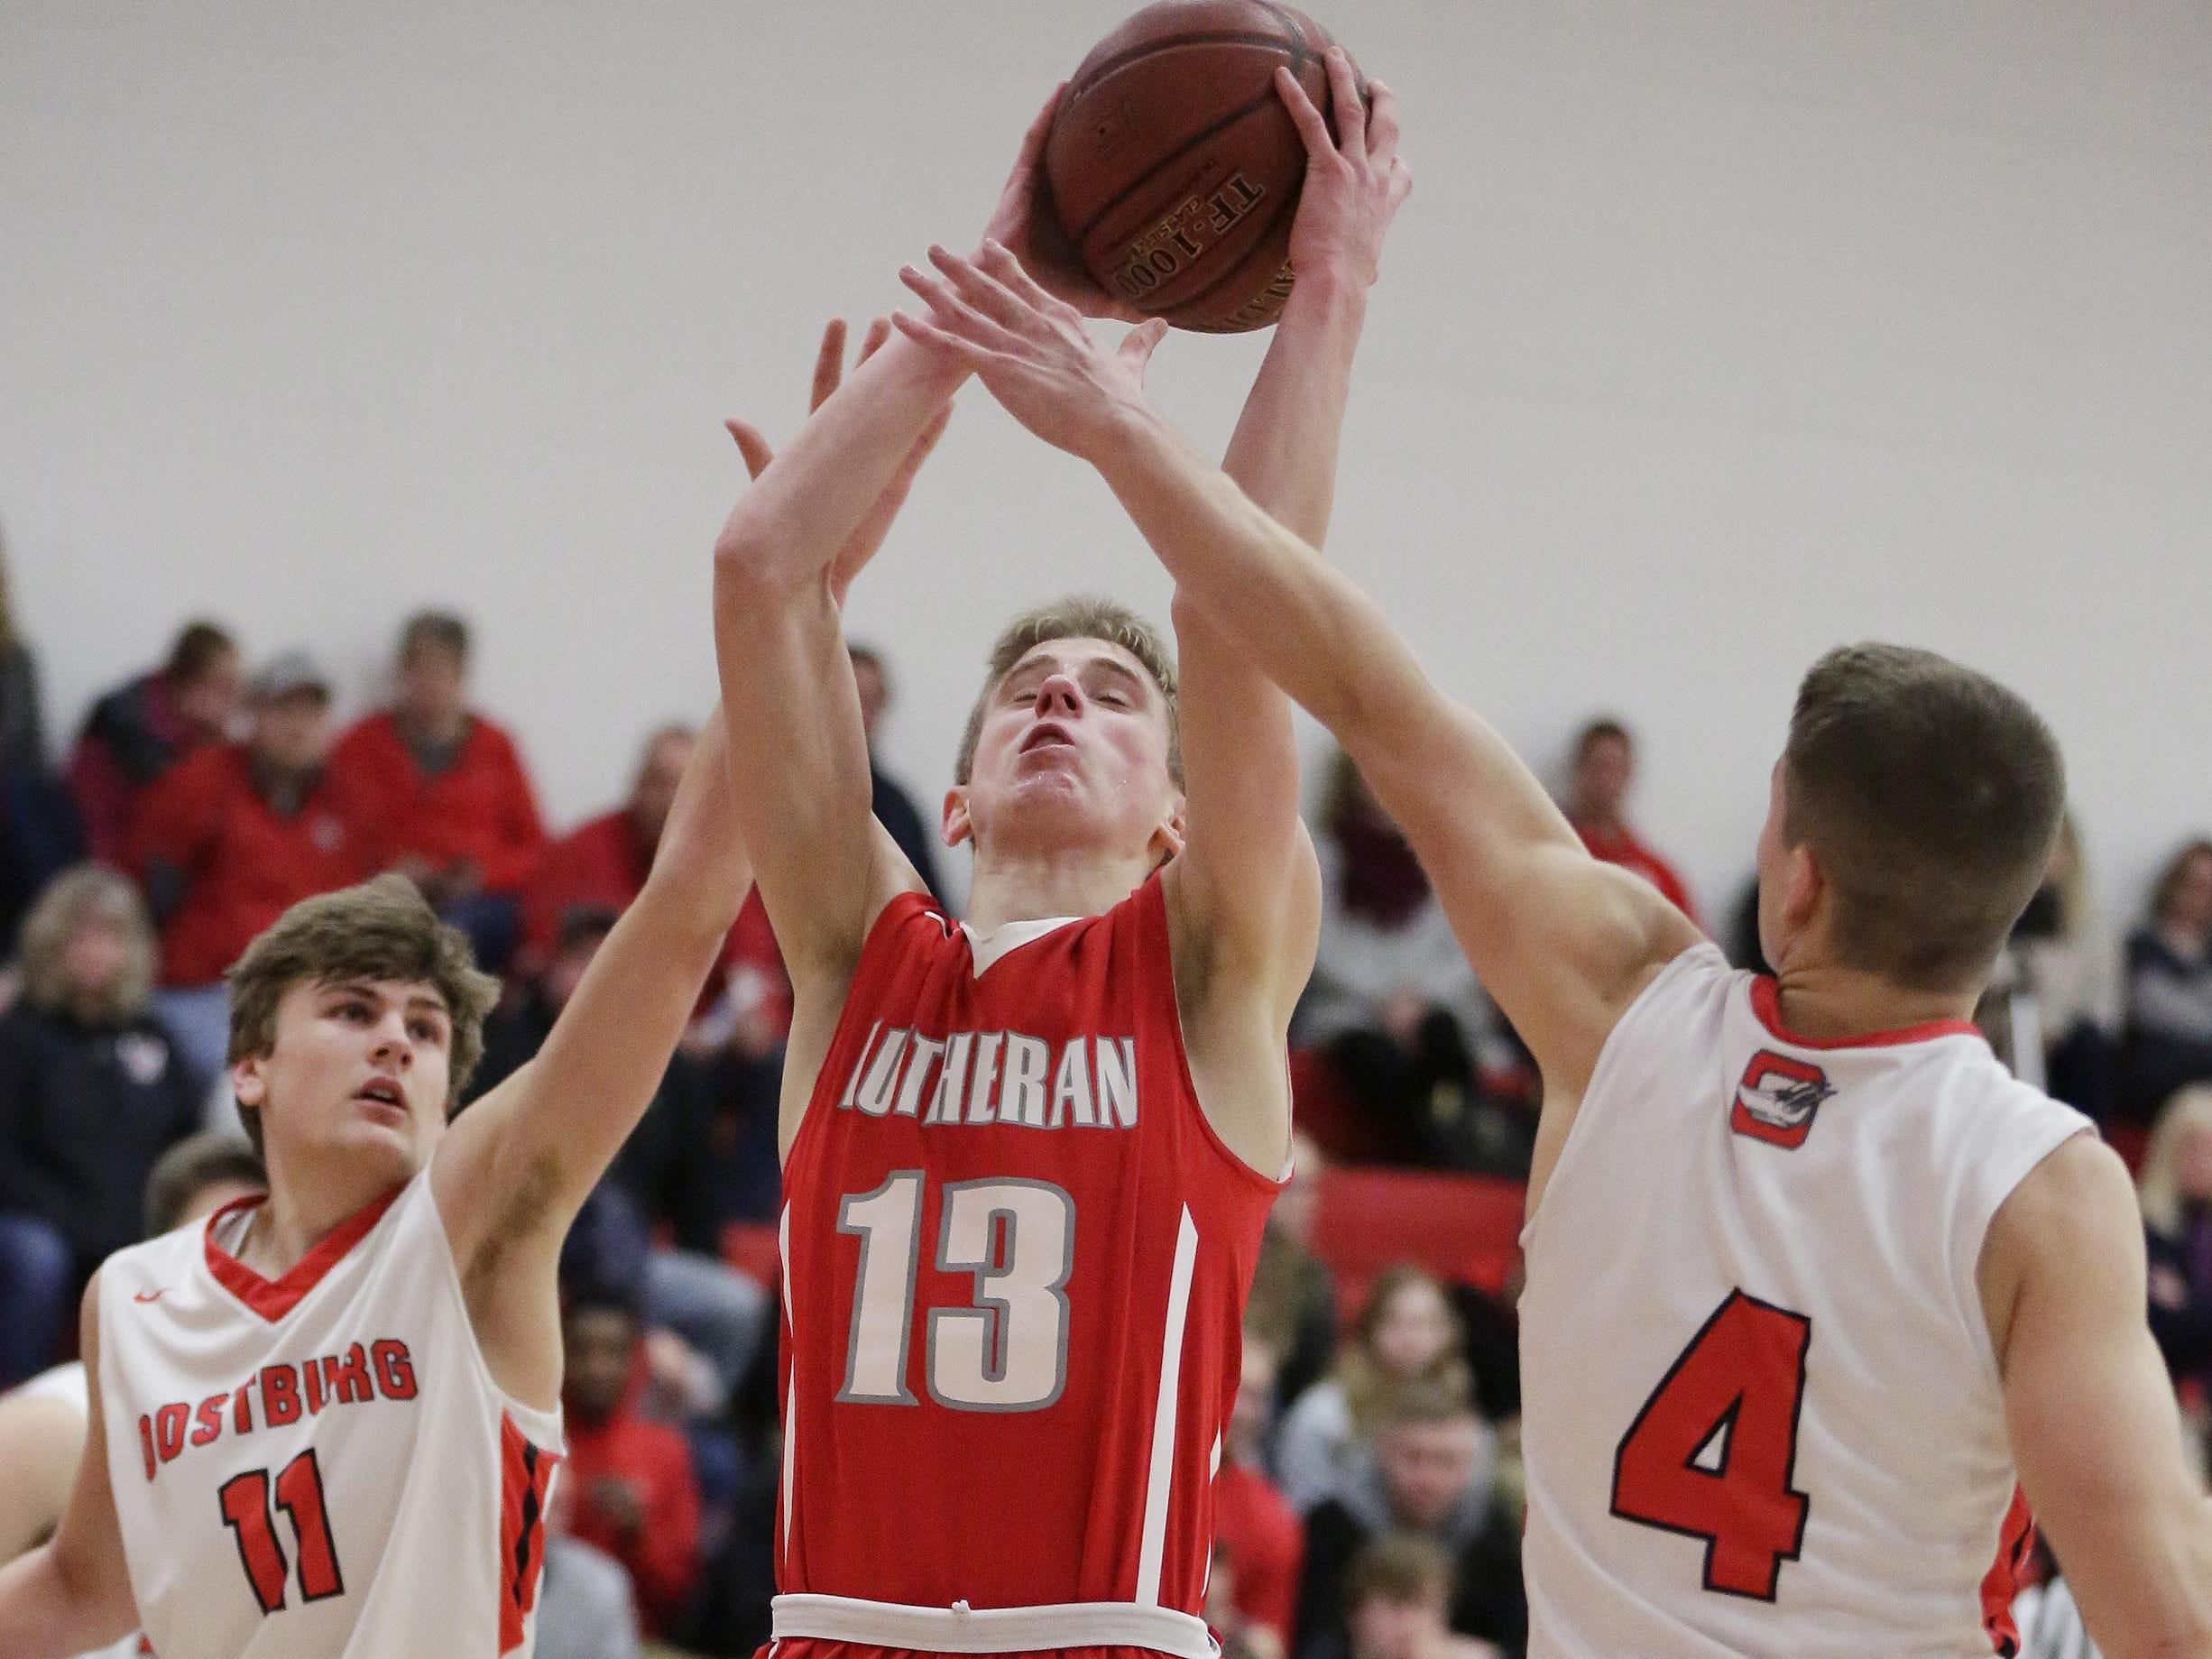 Manitowoc Lutheran's Evan Lischka (13) aims a shot against Oostburg, Friday, February 8, 2019, in Oostburg, Wis. Gary C. Klein/USA TODAY NETWORK-Wisconsin